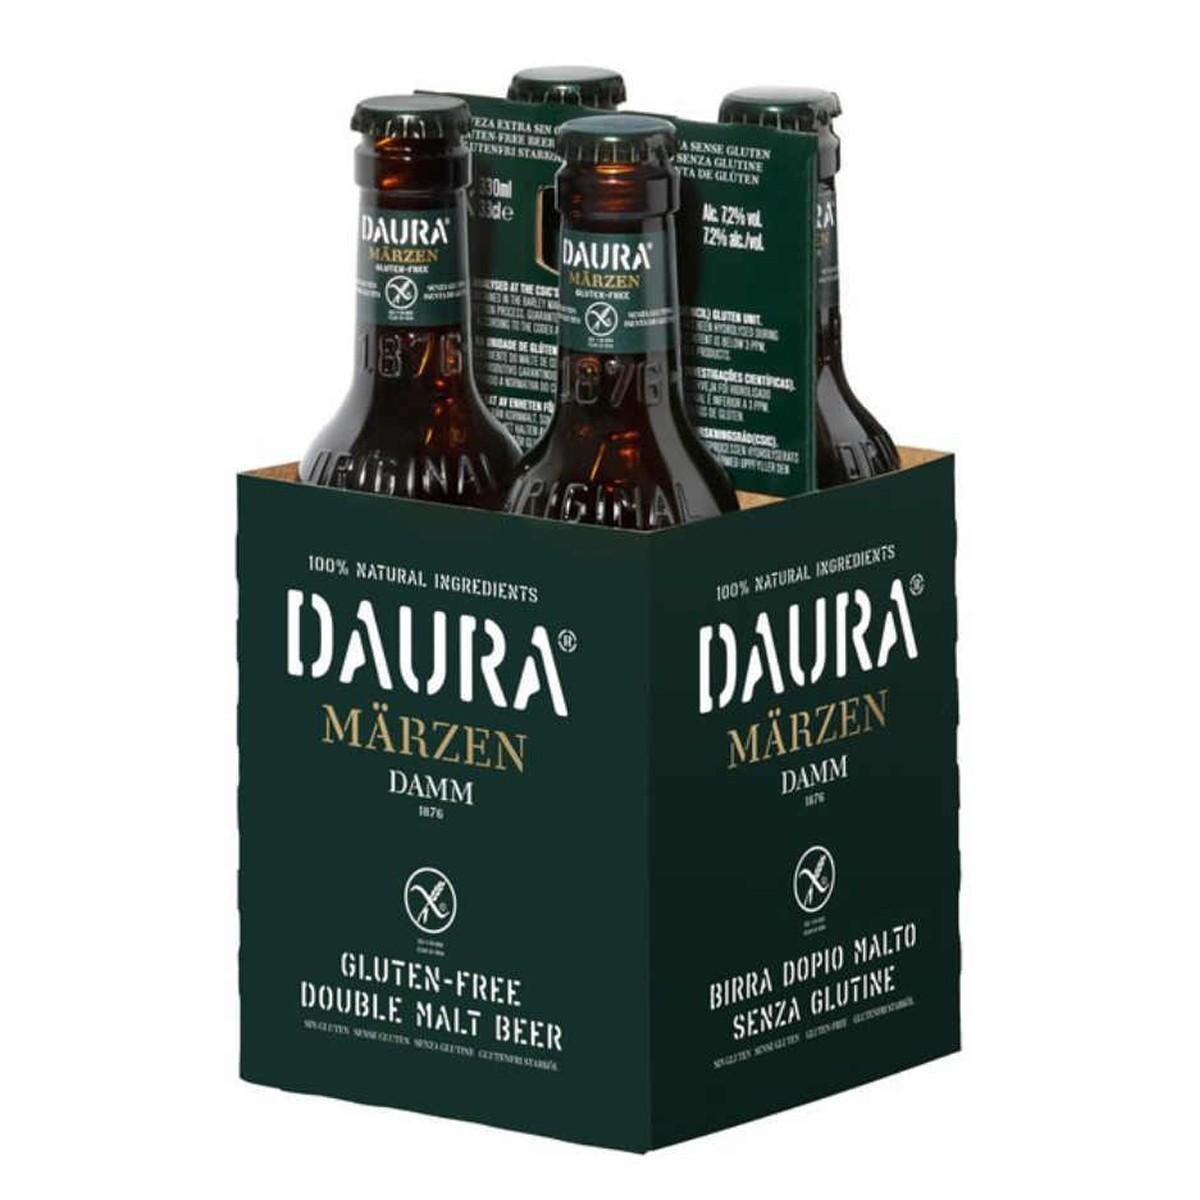 Estrella Daura Damm Dubbel Malt Bier 4-pack